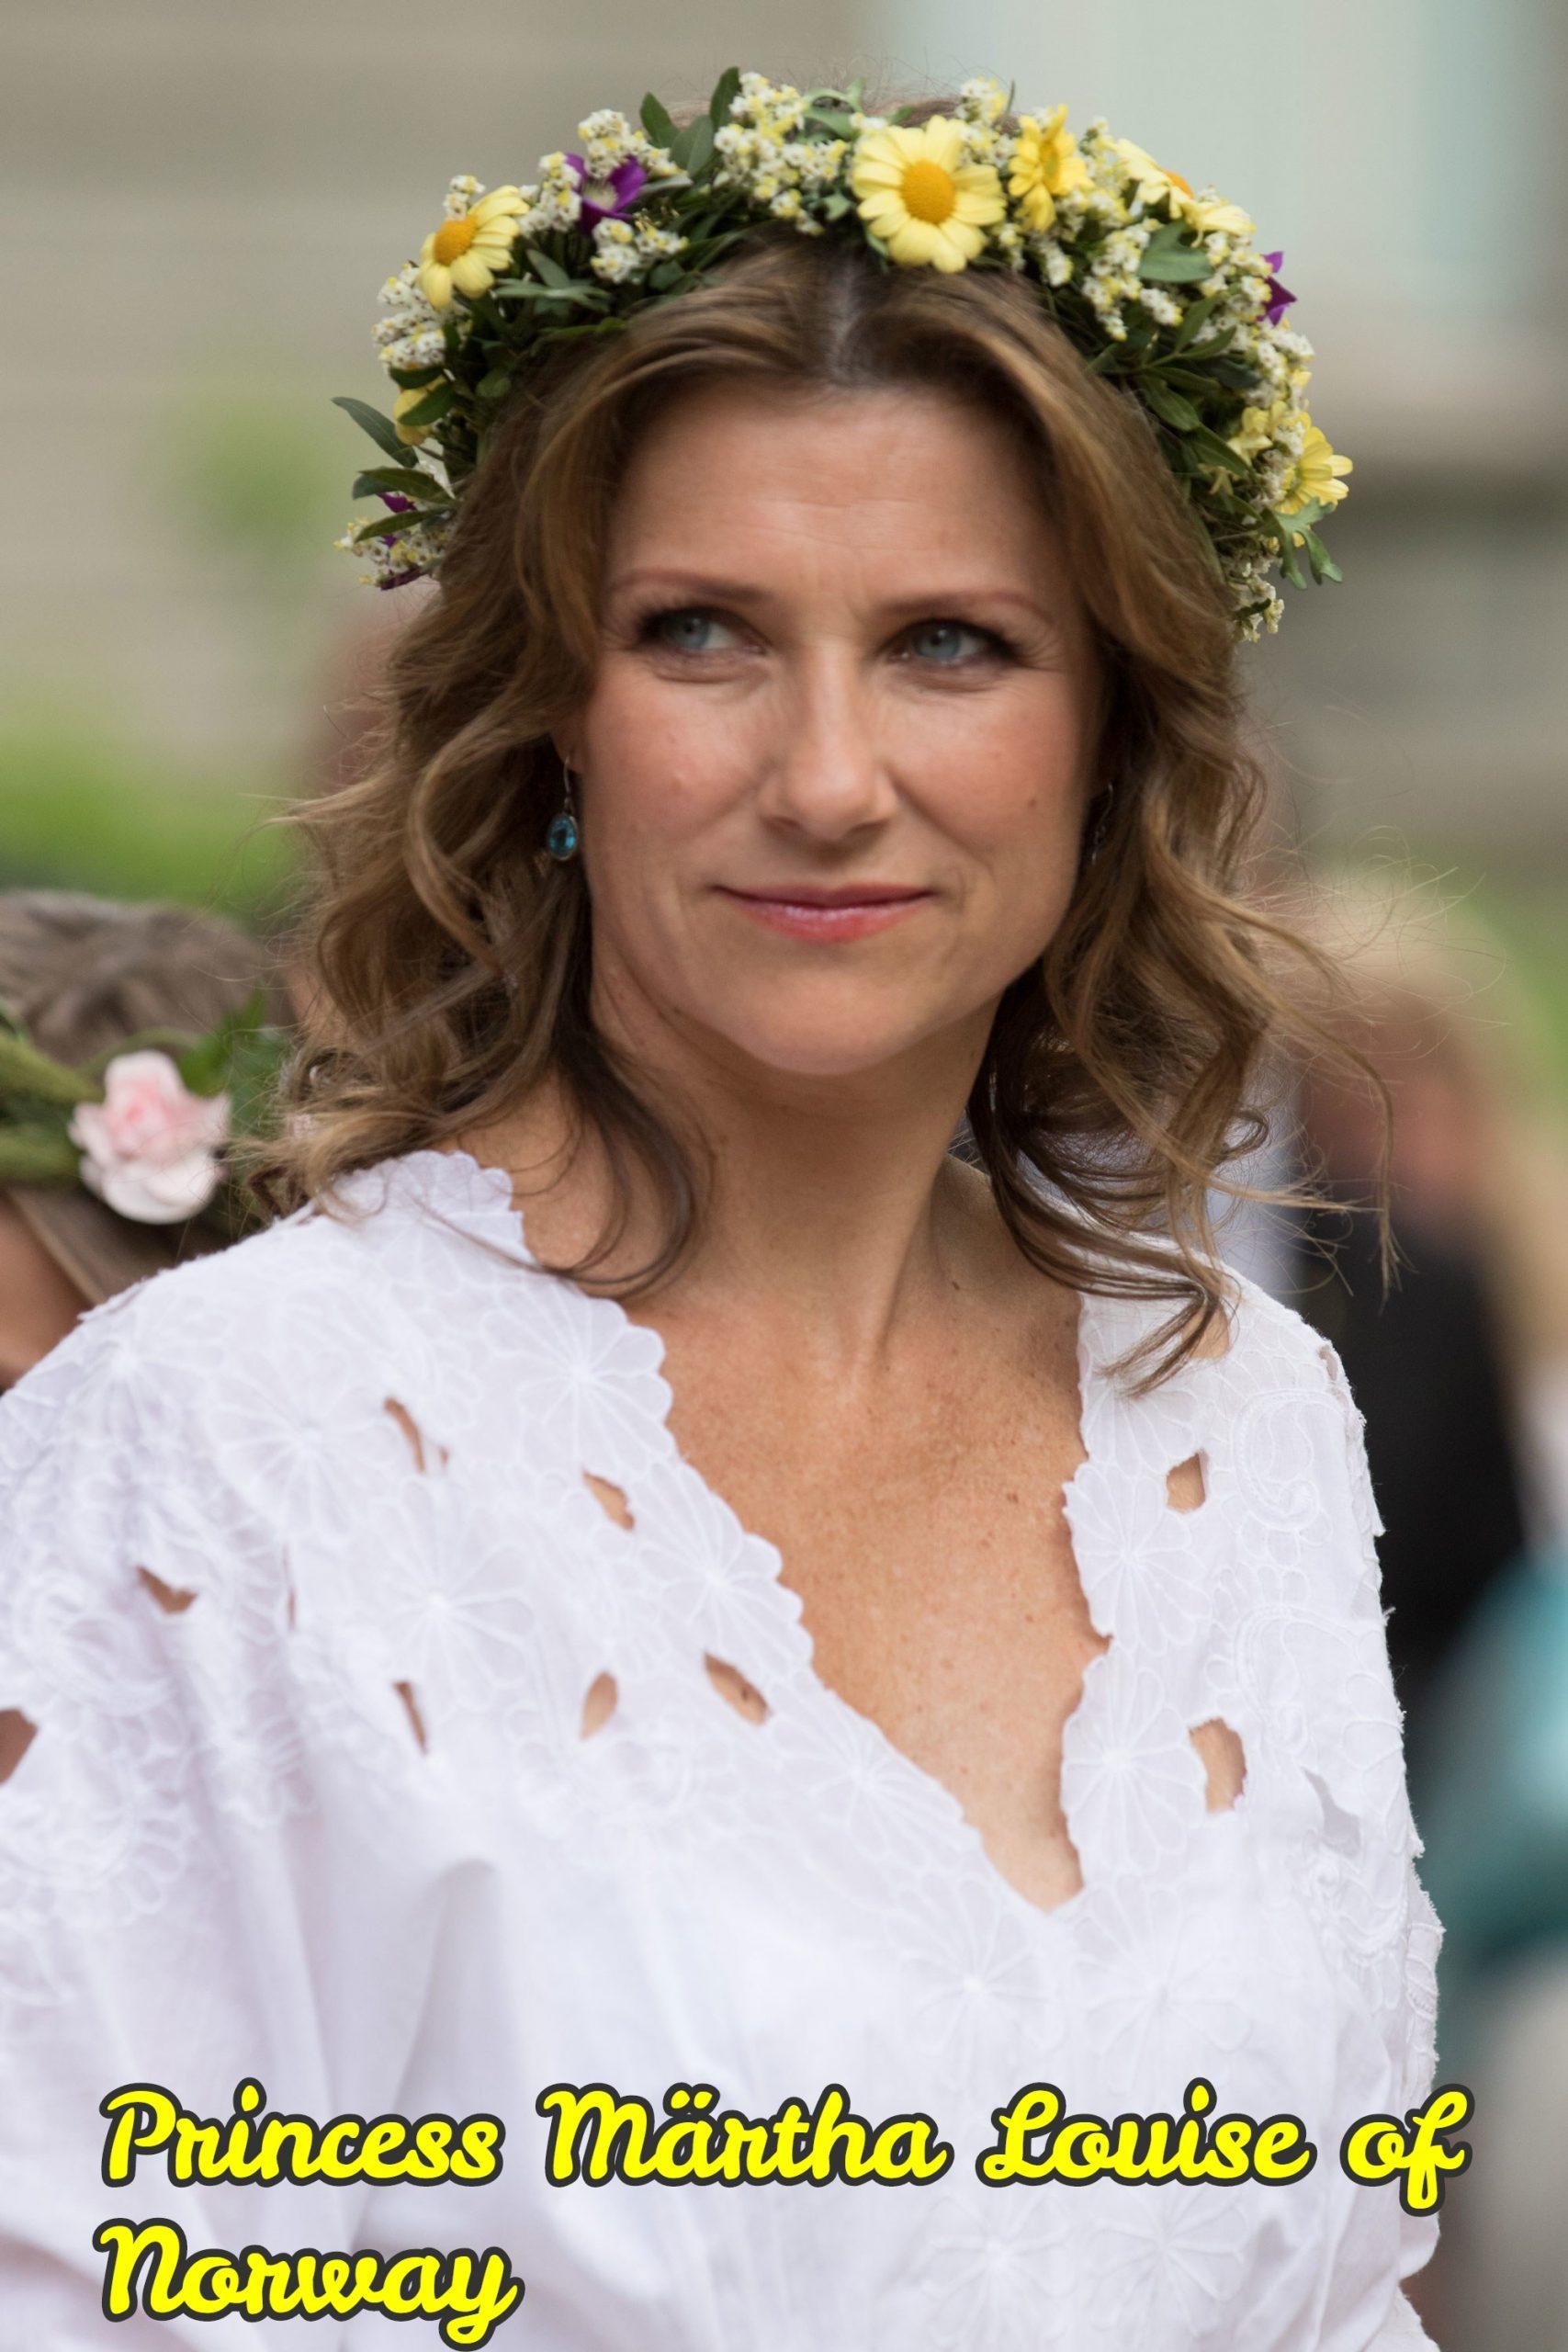 Norway Louise  nackt Maertha of Princess Princess Märtha